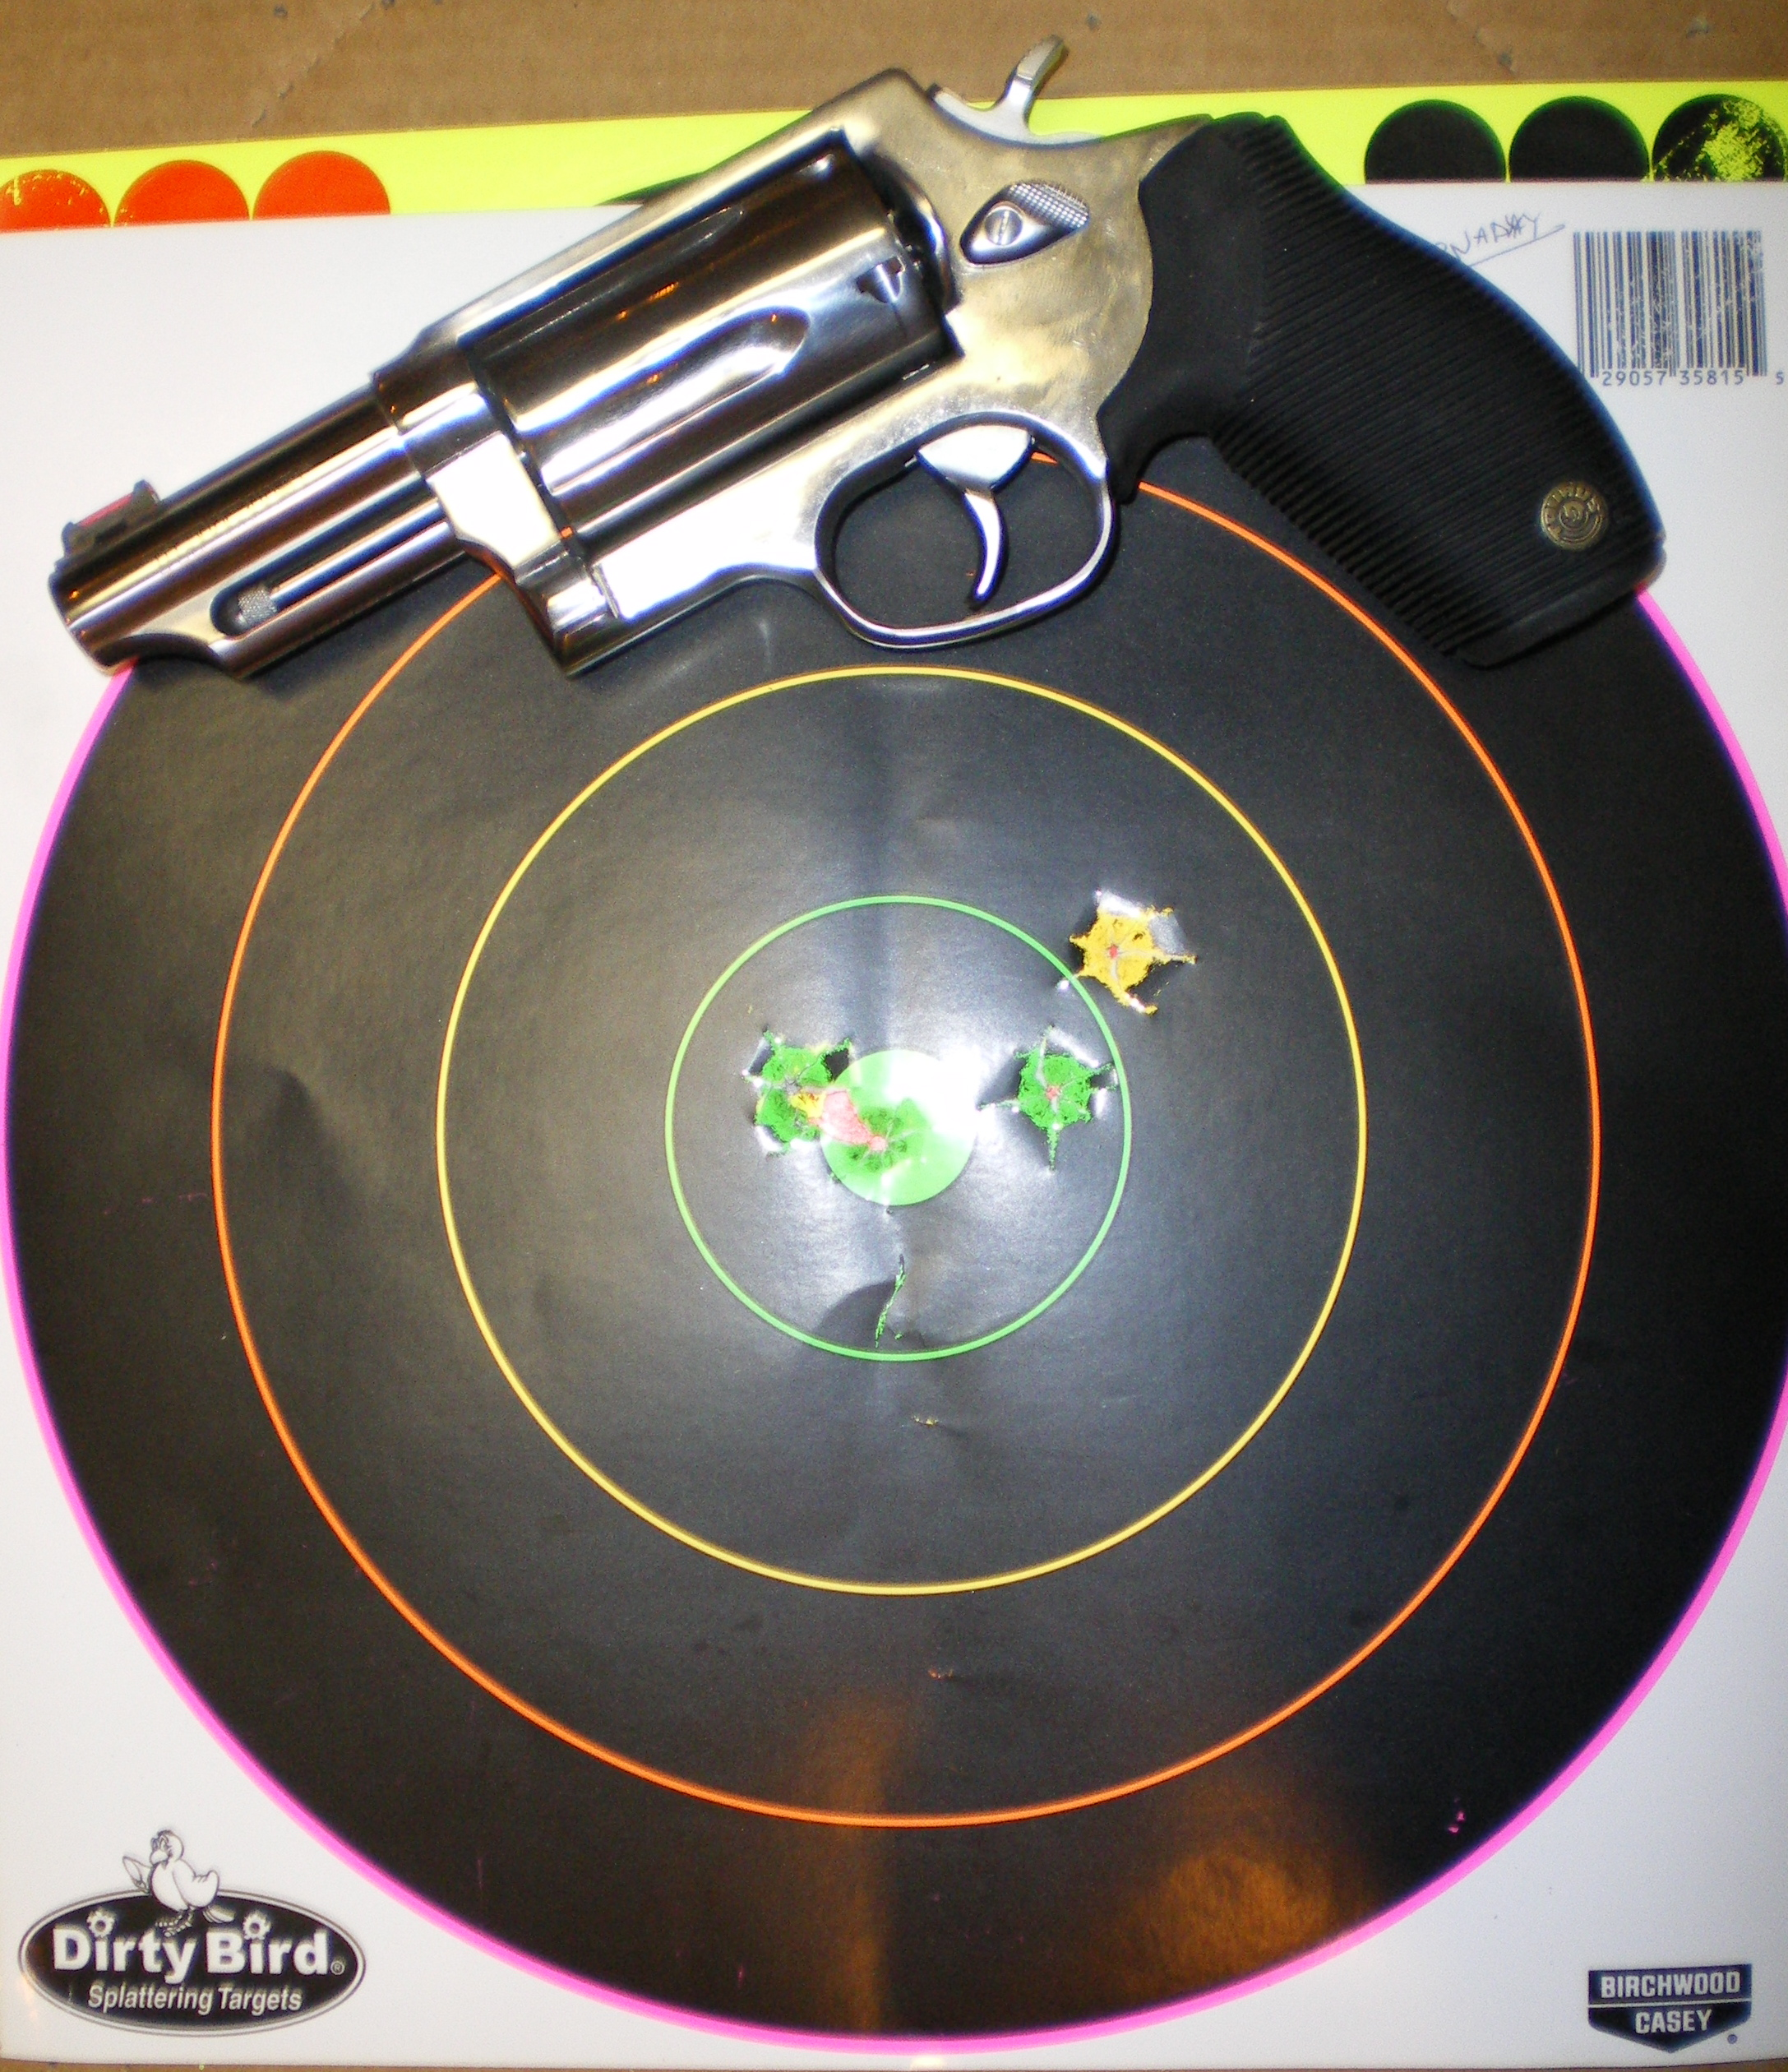 the verdict taurus judge revolver s w a t magazine